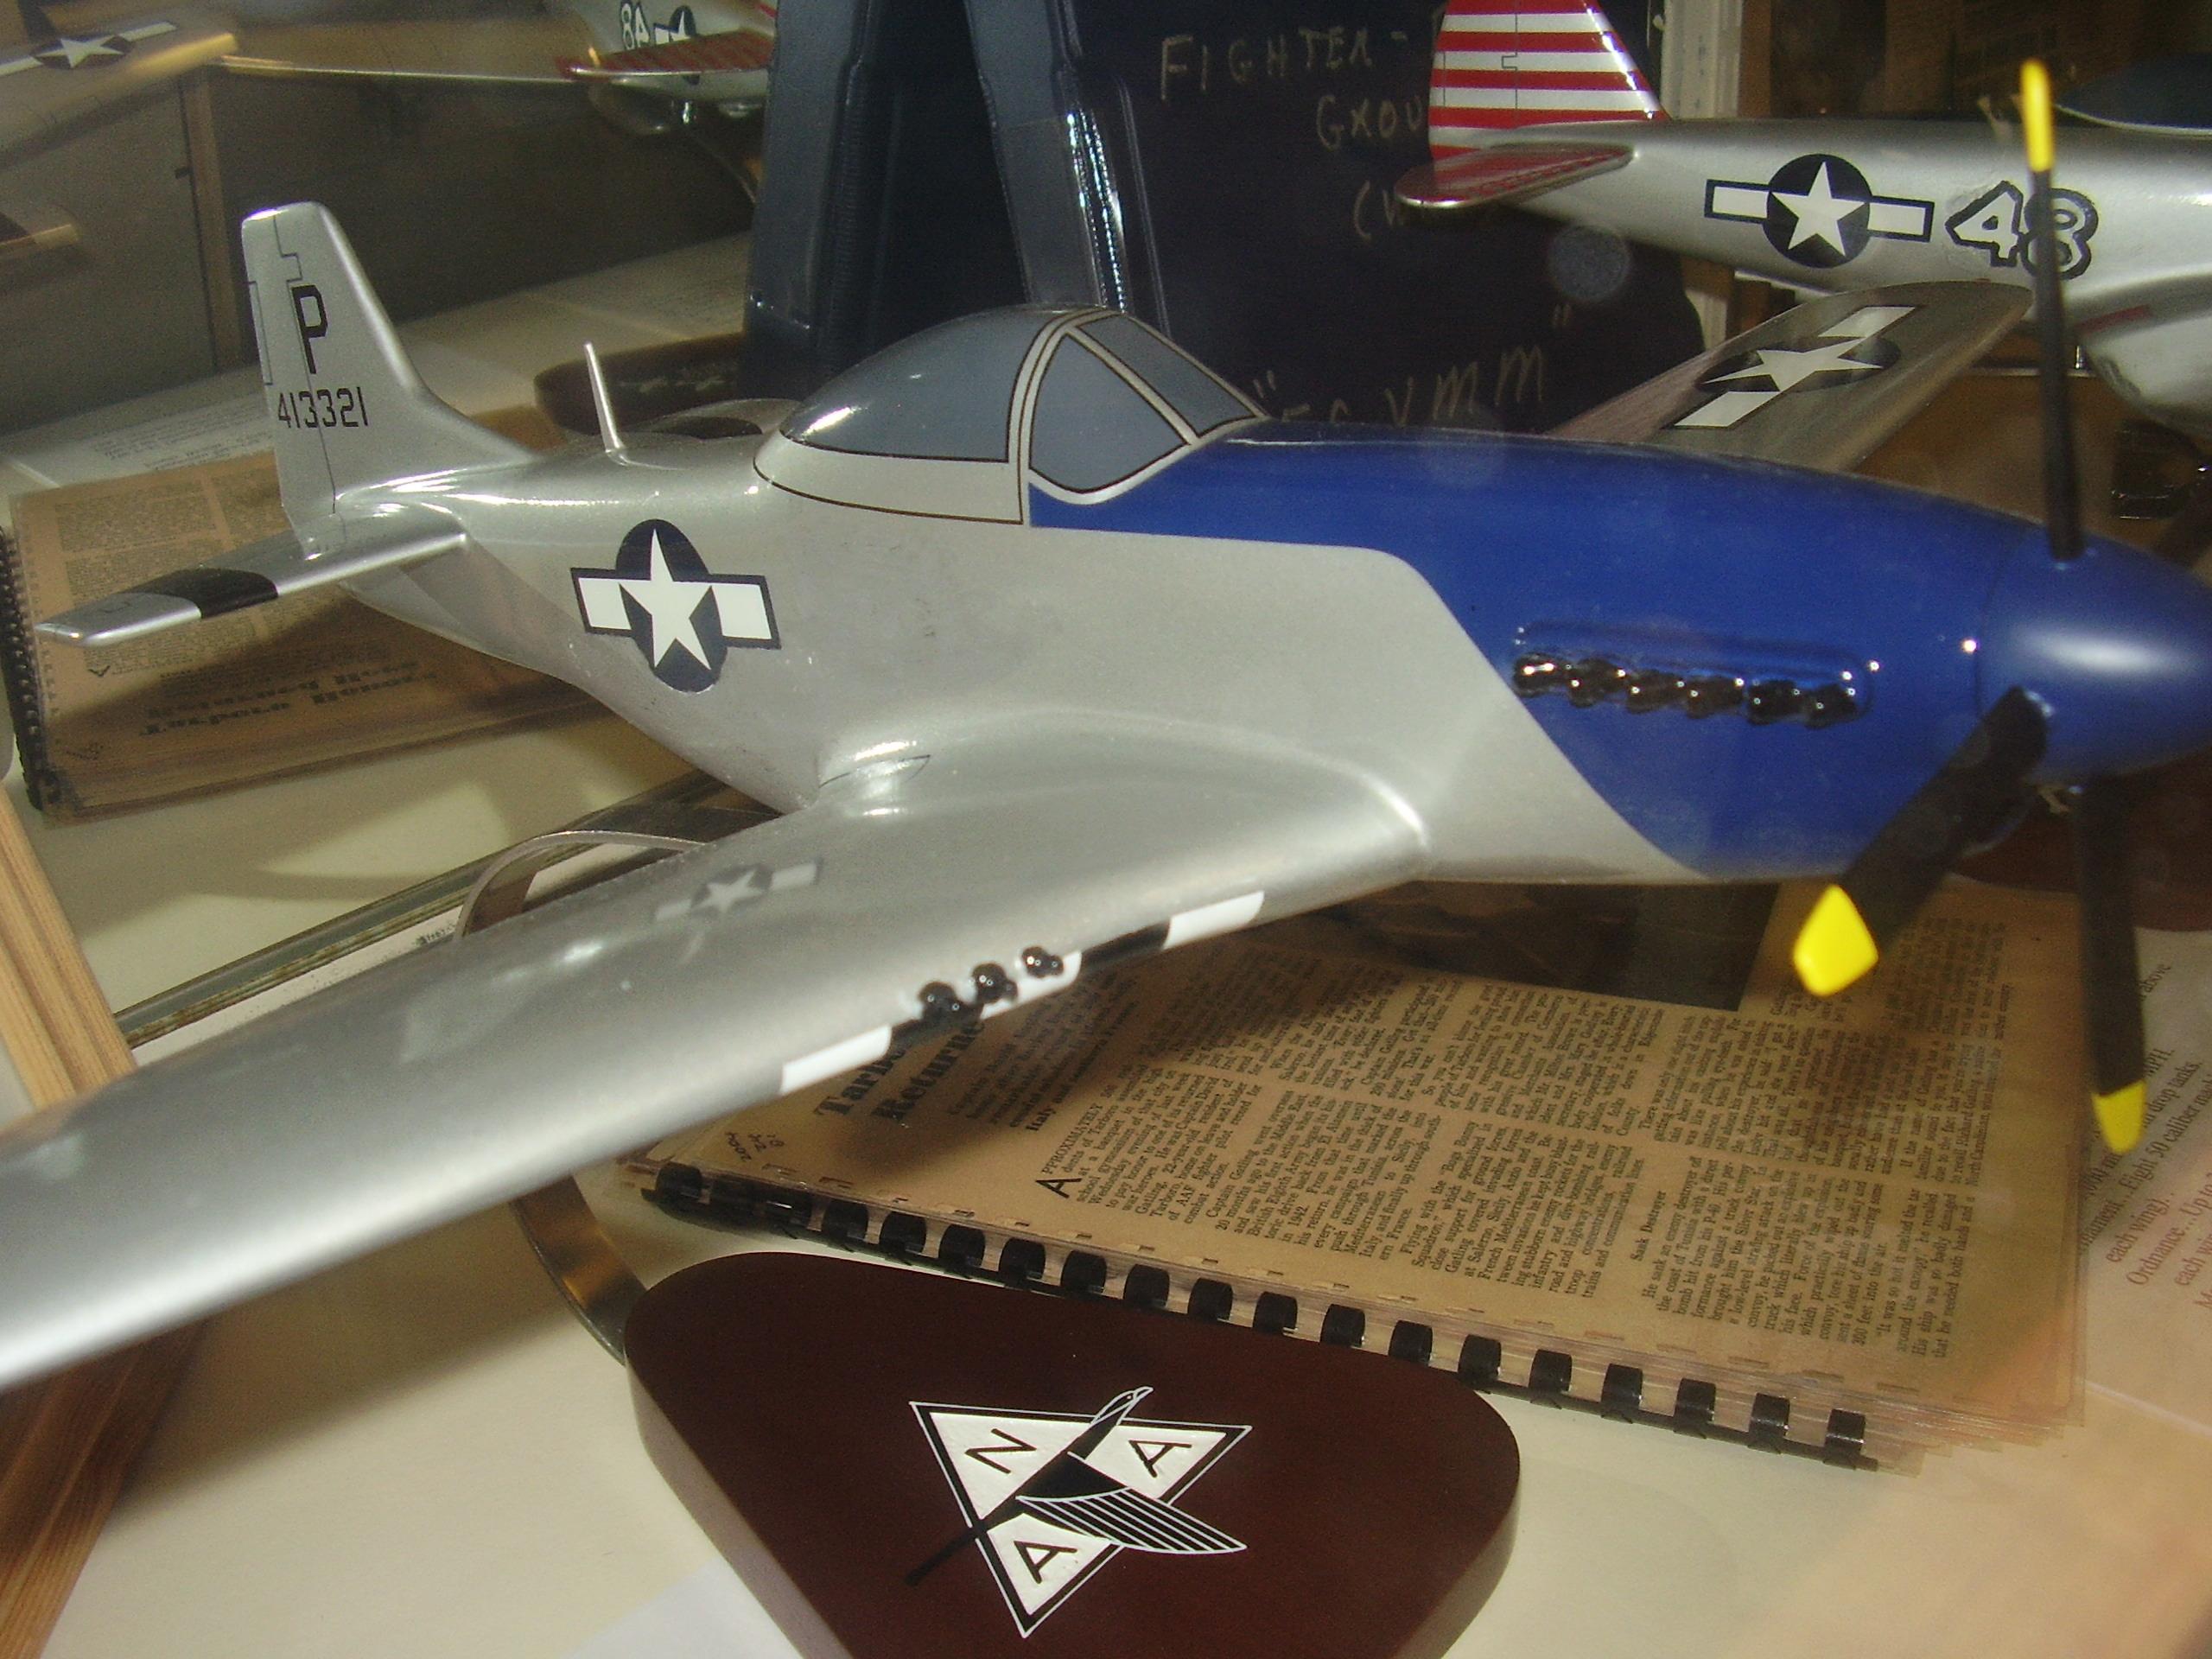 P-51 Mustang model airplane.